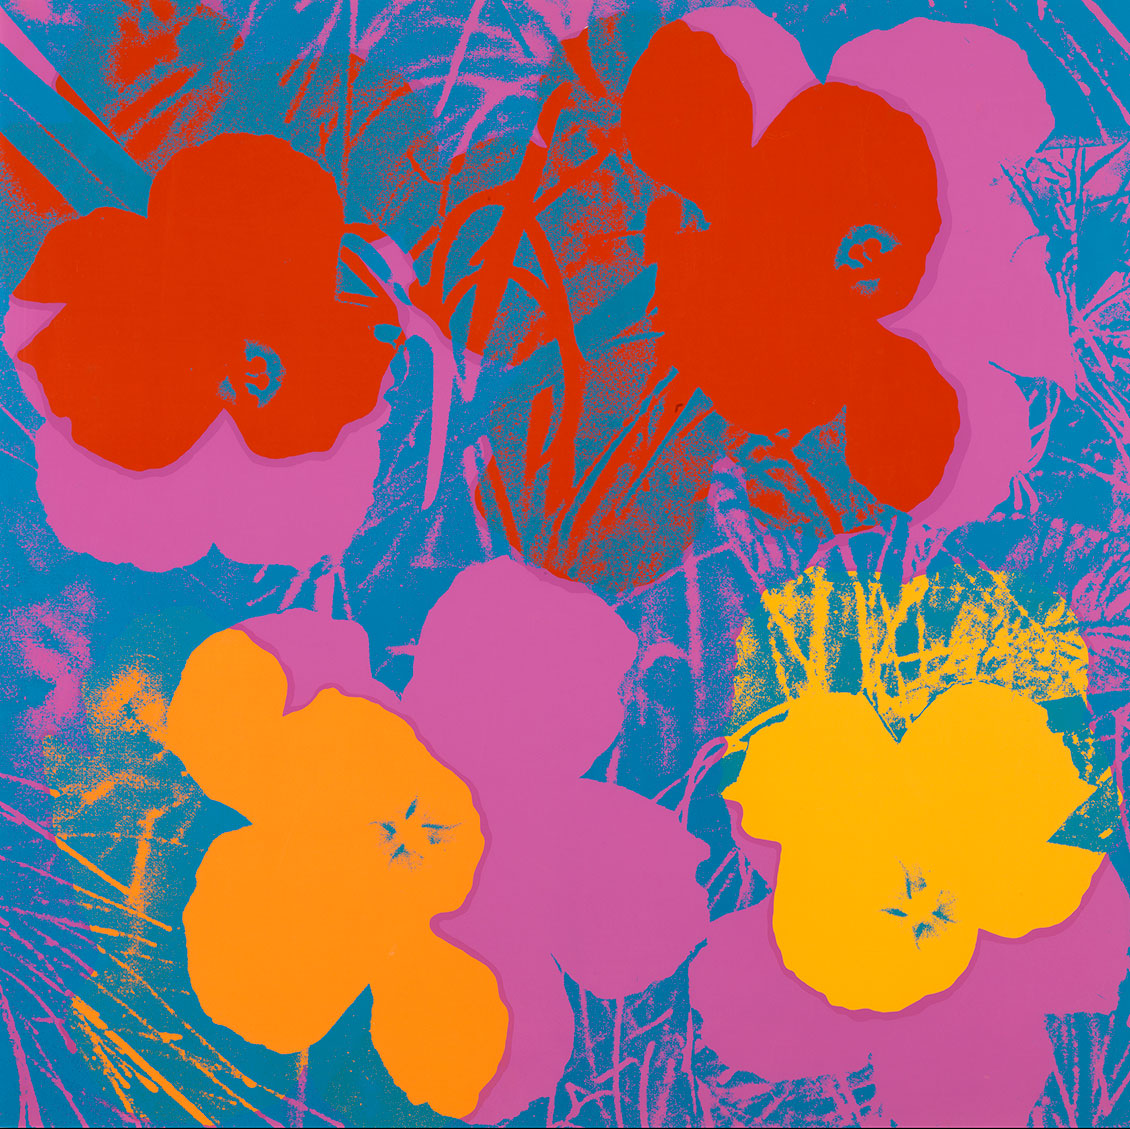 Andy Warhol, Flowers, 1970. Louisiana Museum of Modern Art, Humlebæk. Foto: Poul Buchard / Brøndum & Co.